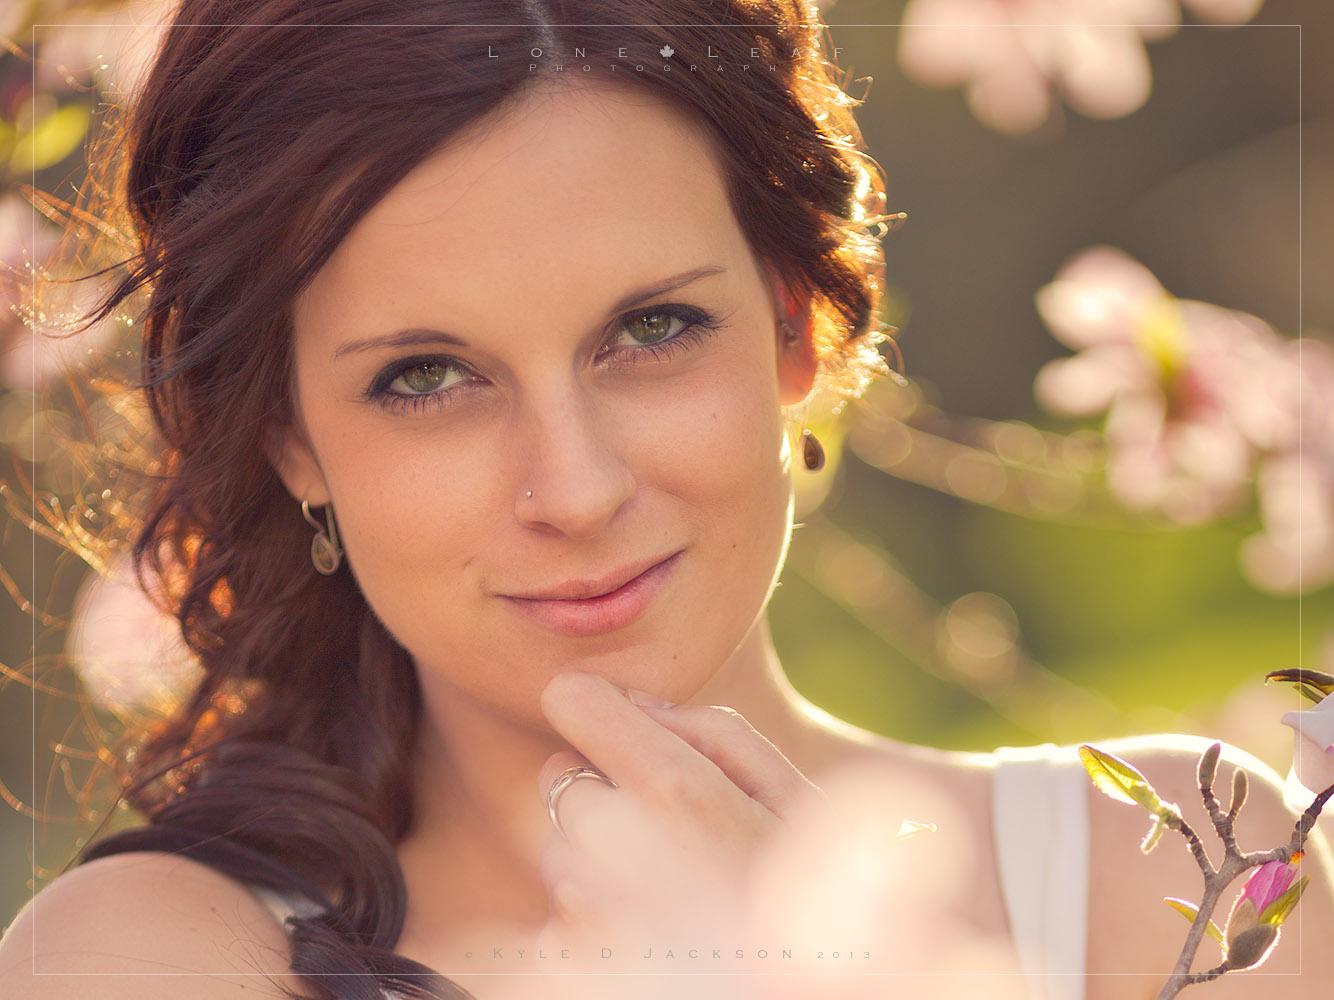 Photoshoot with Becky, Ottawa, Ontario, 3 May 2013.